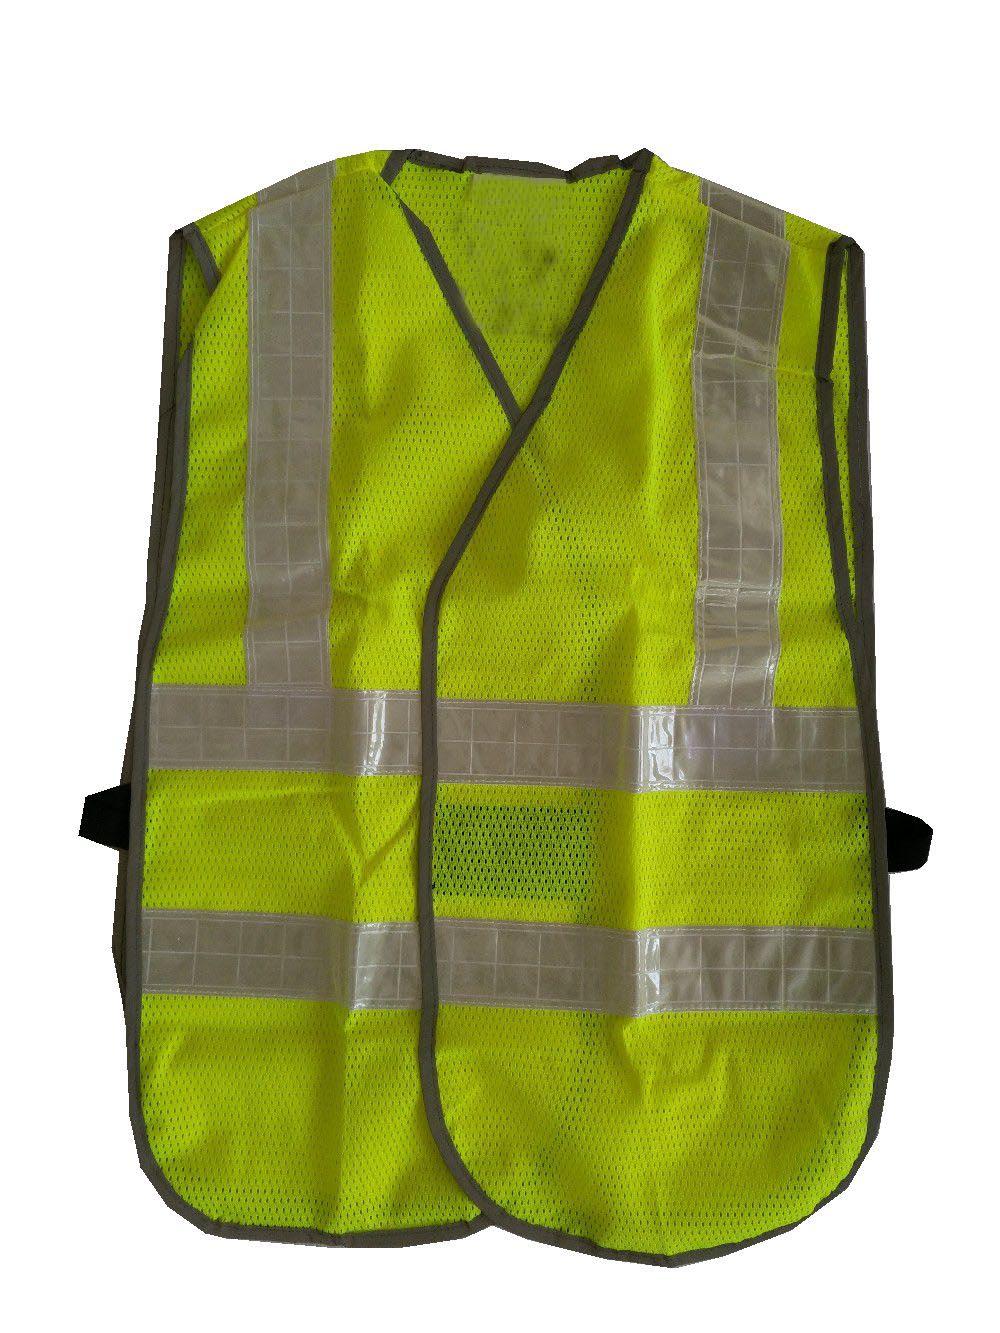 Construction Worker Reflective Vest Traffic Reflective Safety Jacket Fluorescent light PVC Tape construction